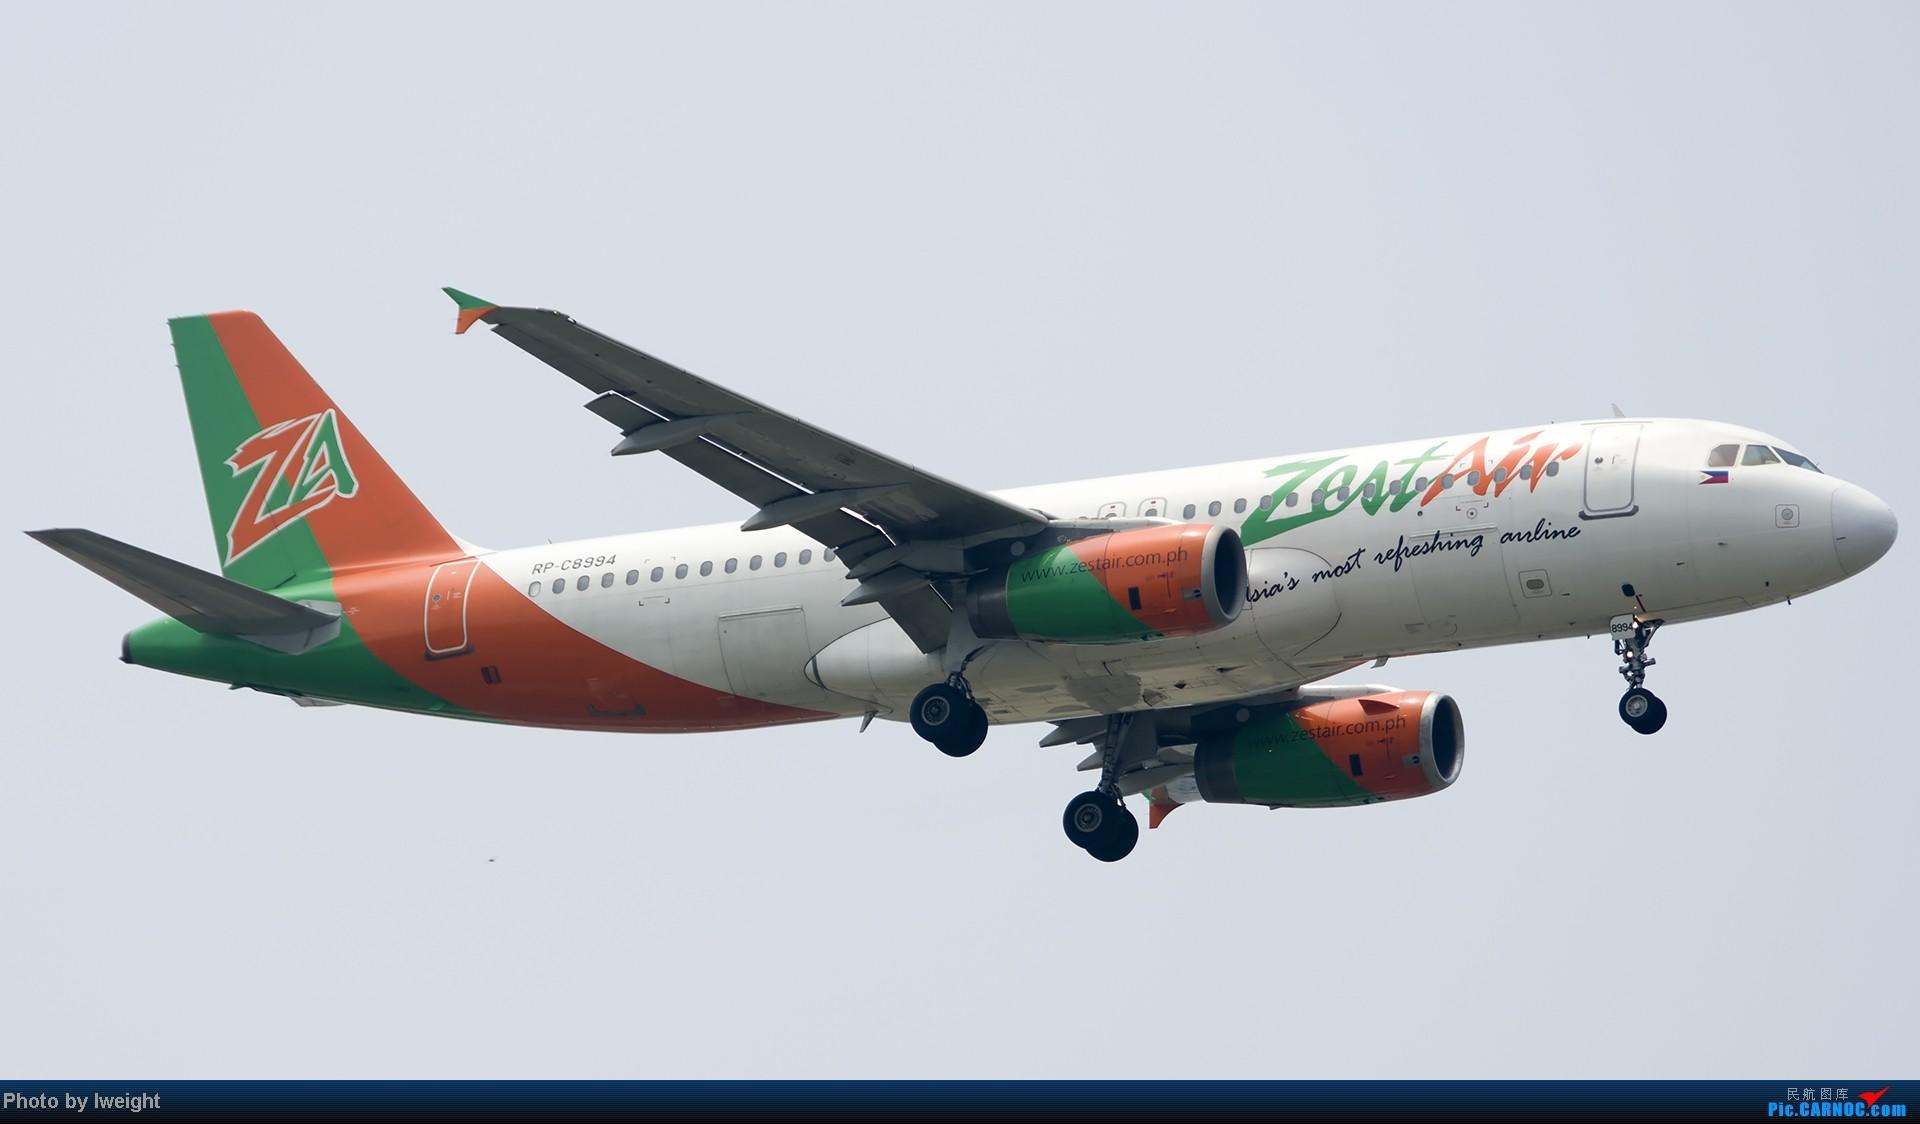 Re:[原创]休假无聊,跑道边来拍机玩(晚点的ZestAir、换装的B6100和刚交付的B2738等) AIRBUS A320-200 RP-C8994 中国北京首都机场